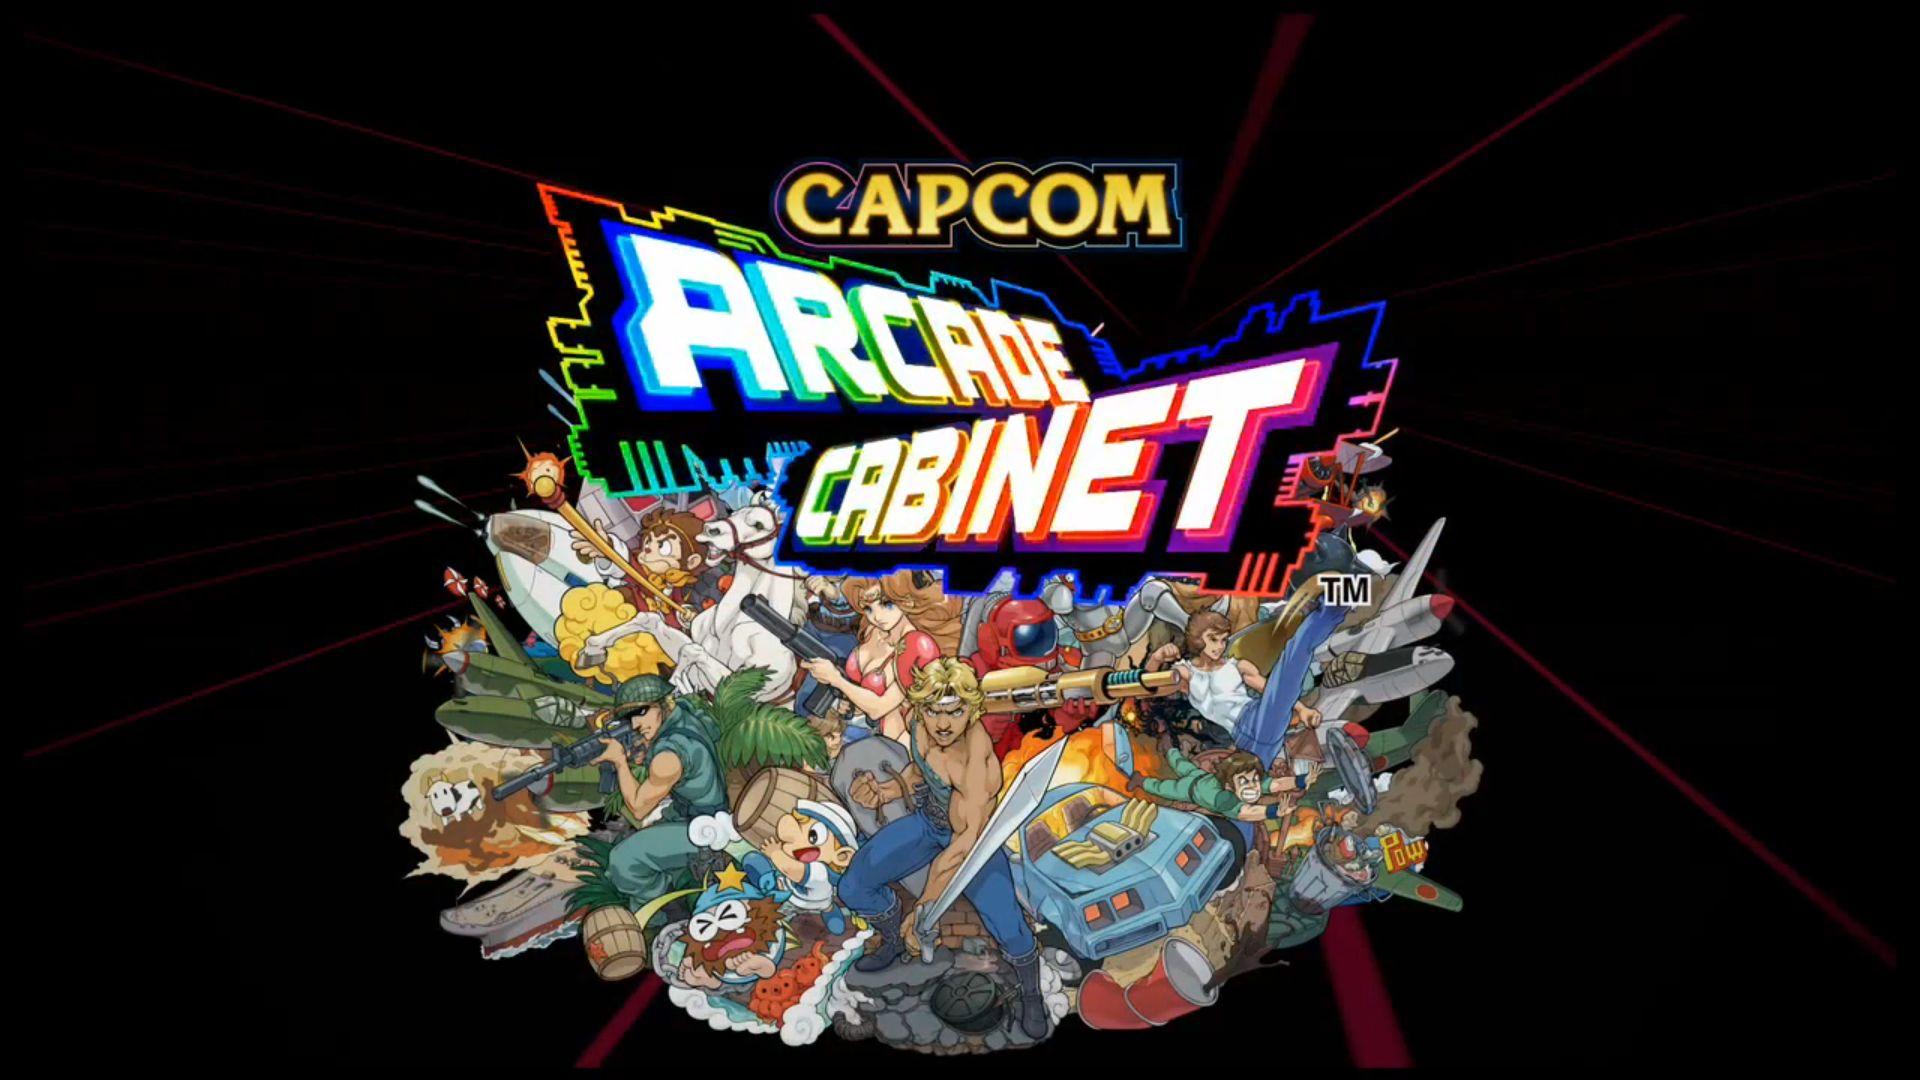 HD Arcade Background